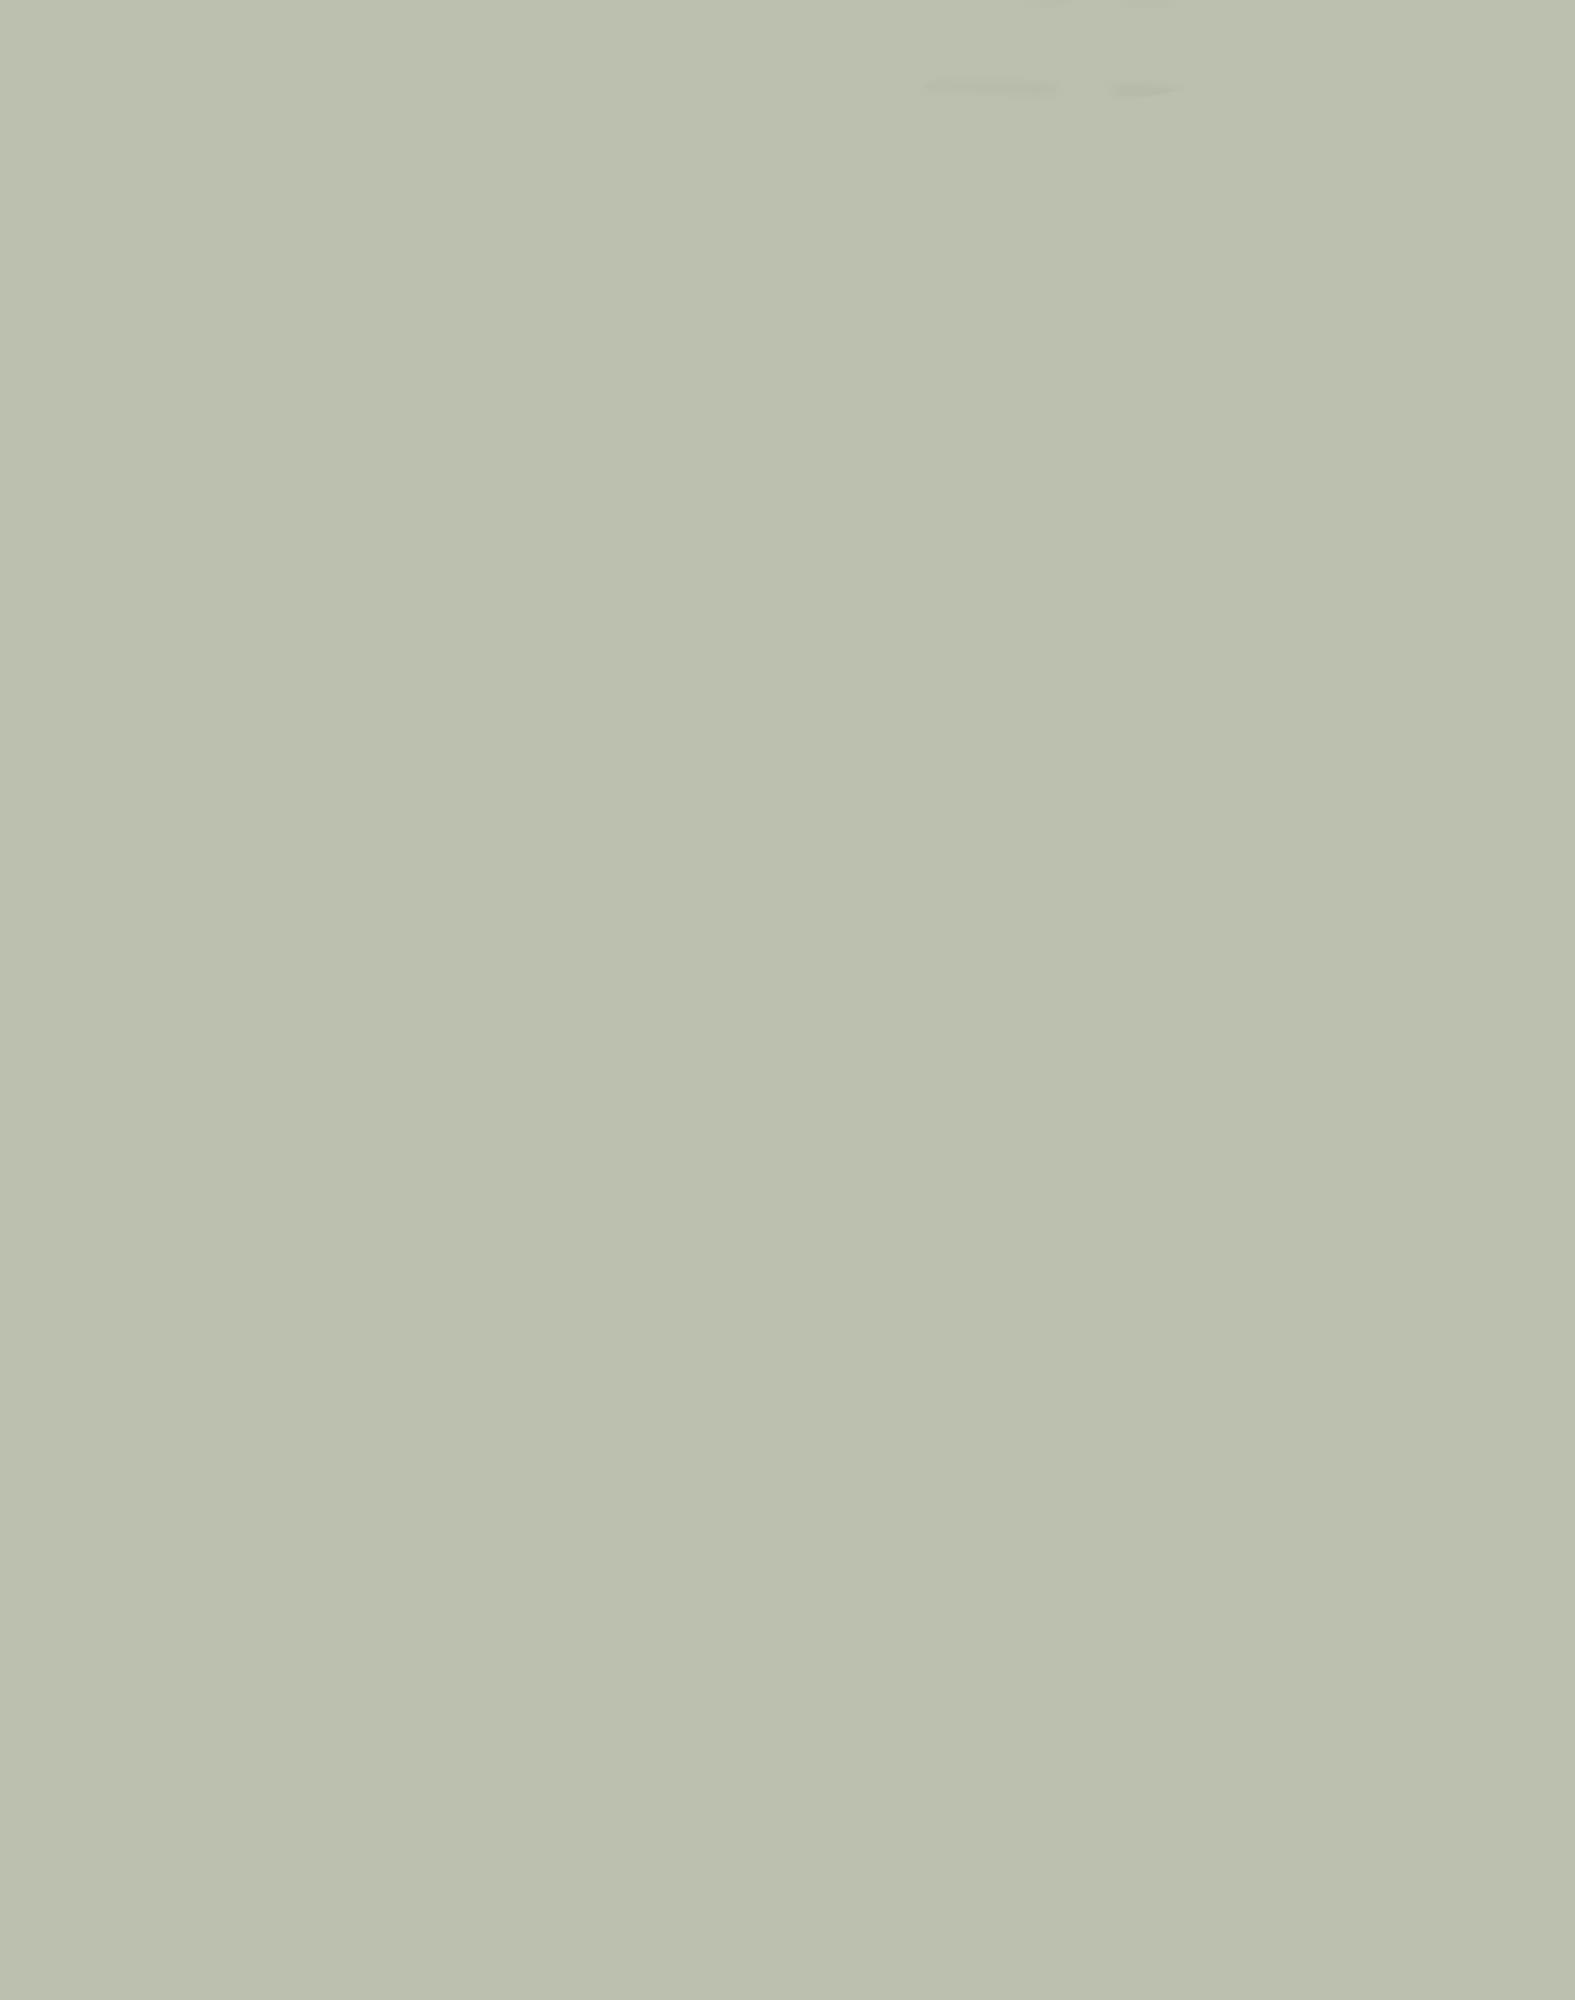 Natural Sage 187,192,175